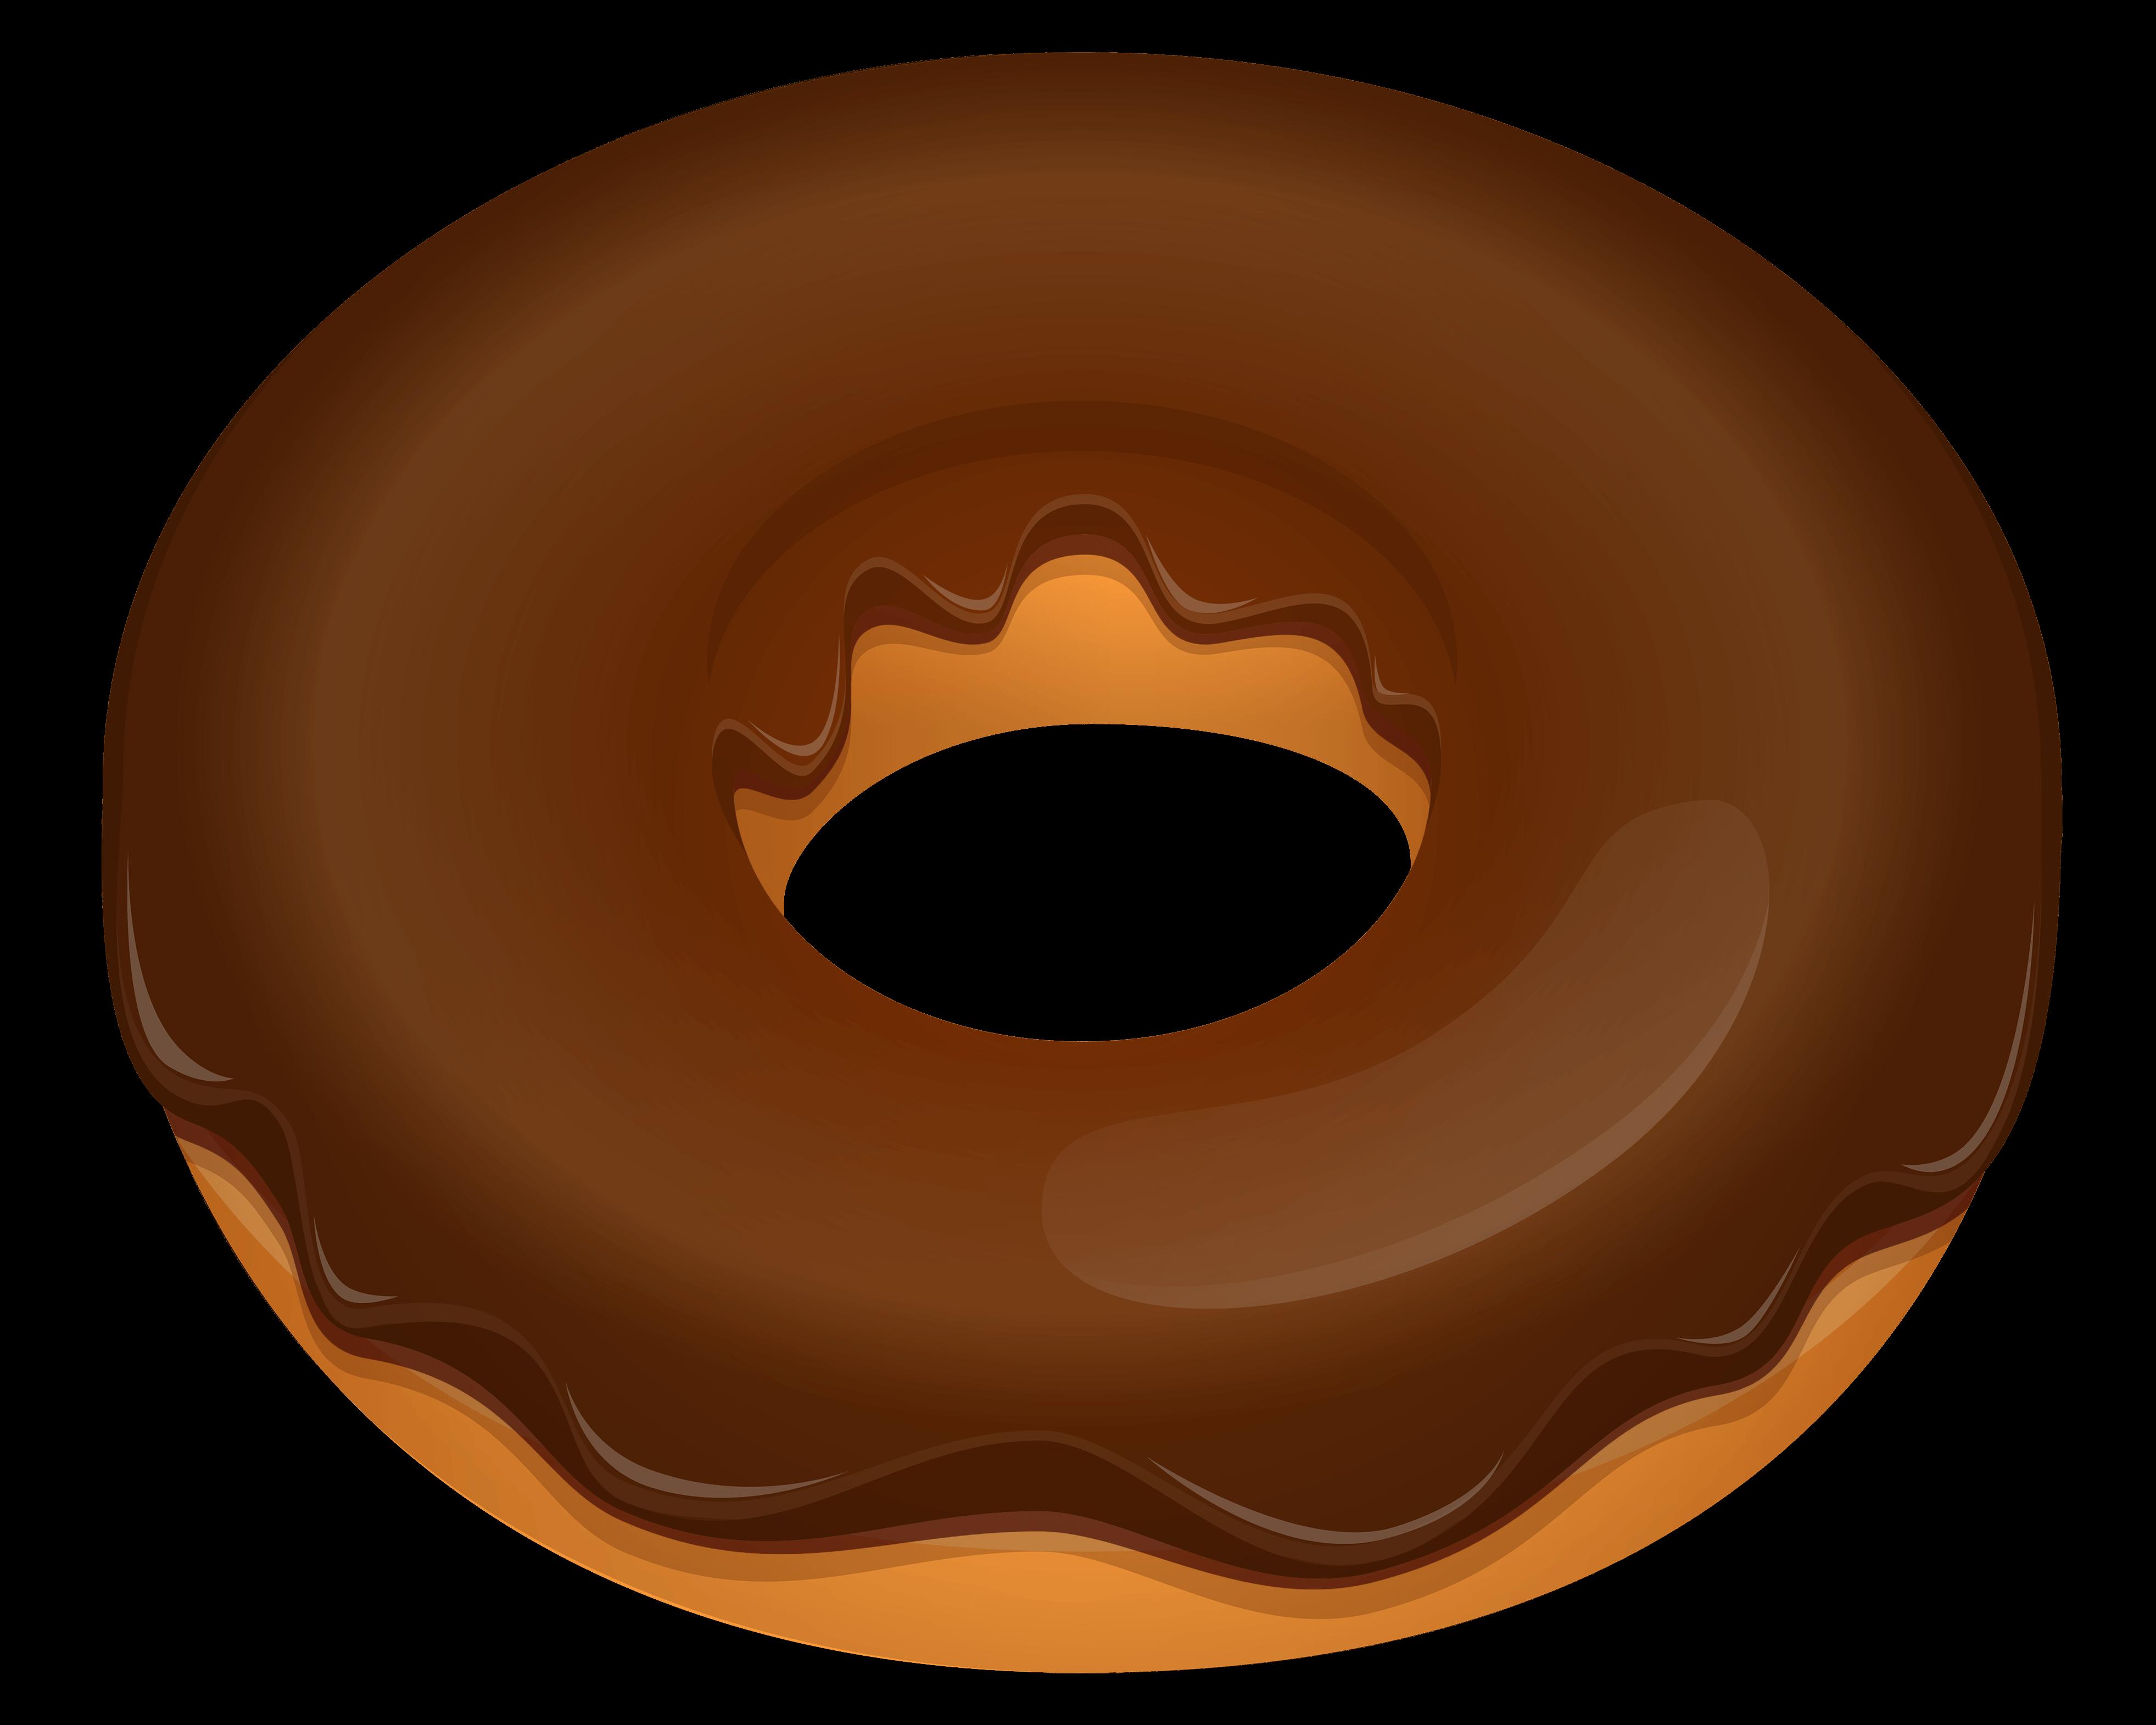 Doughnut clipart food. Donut jokingart com